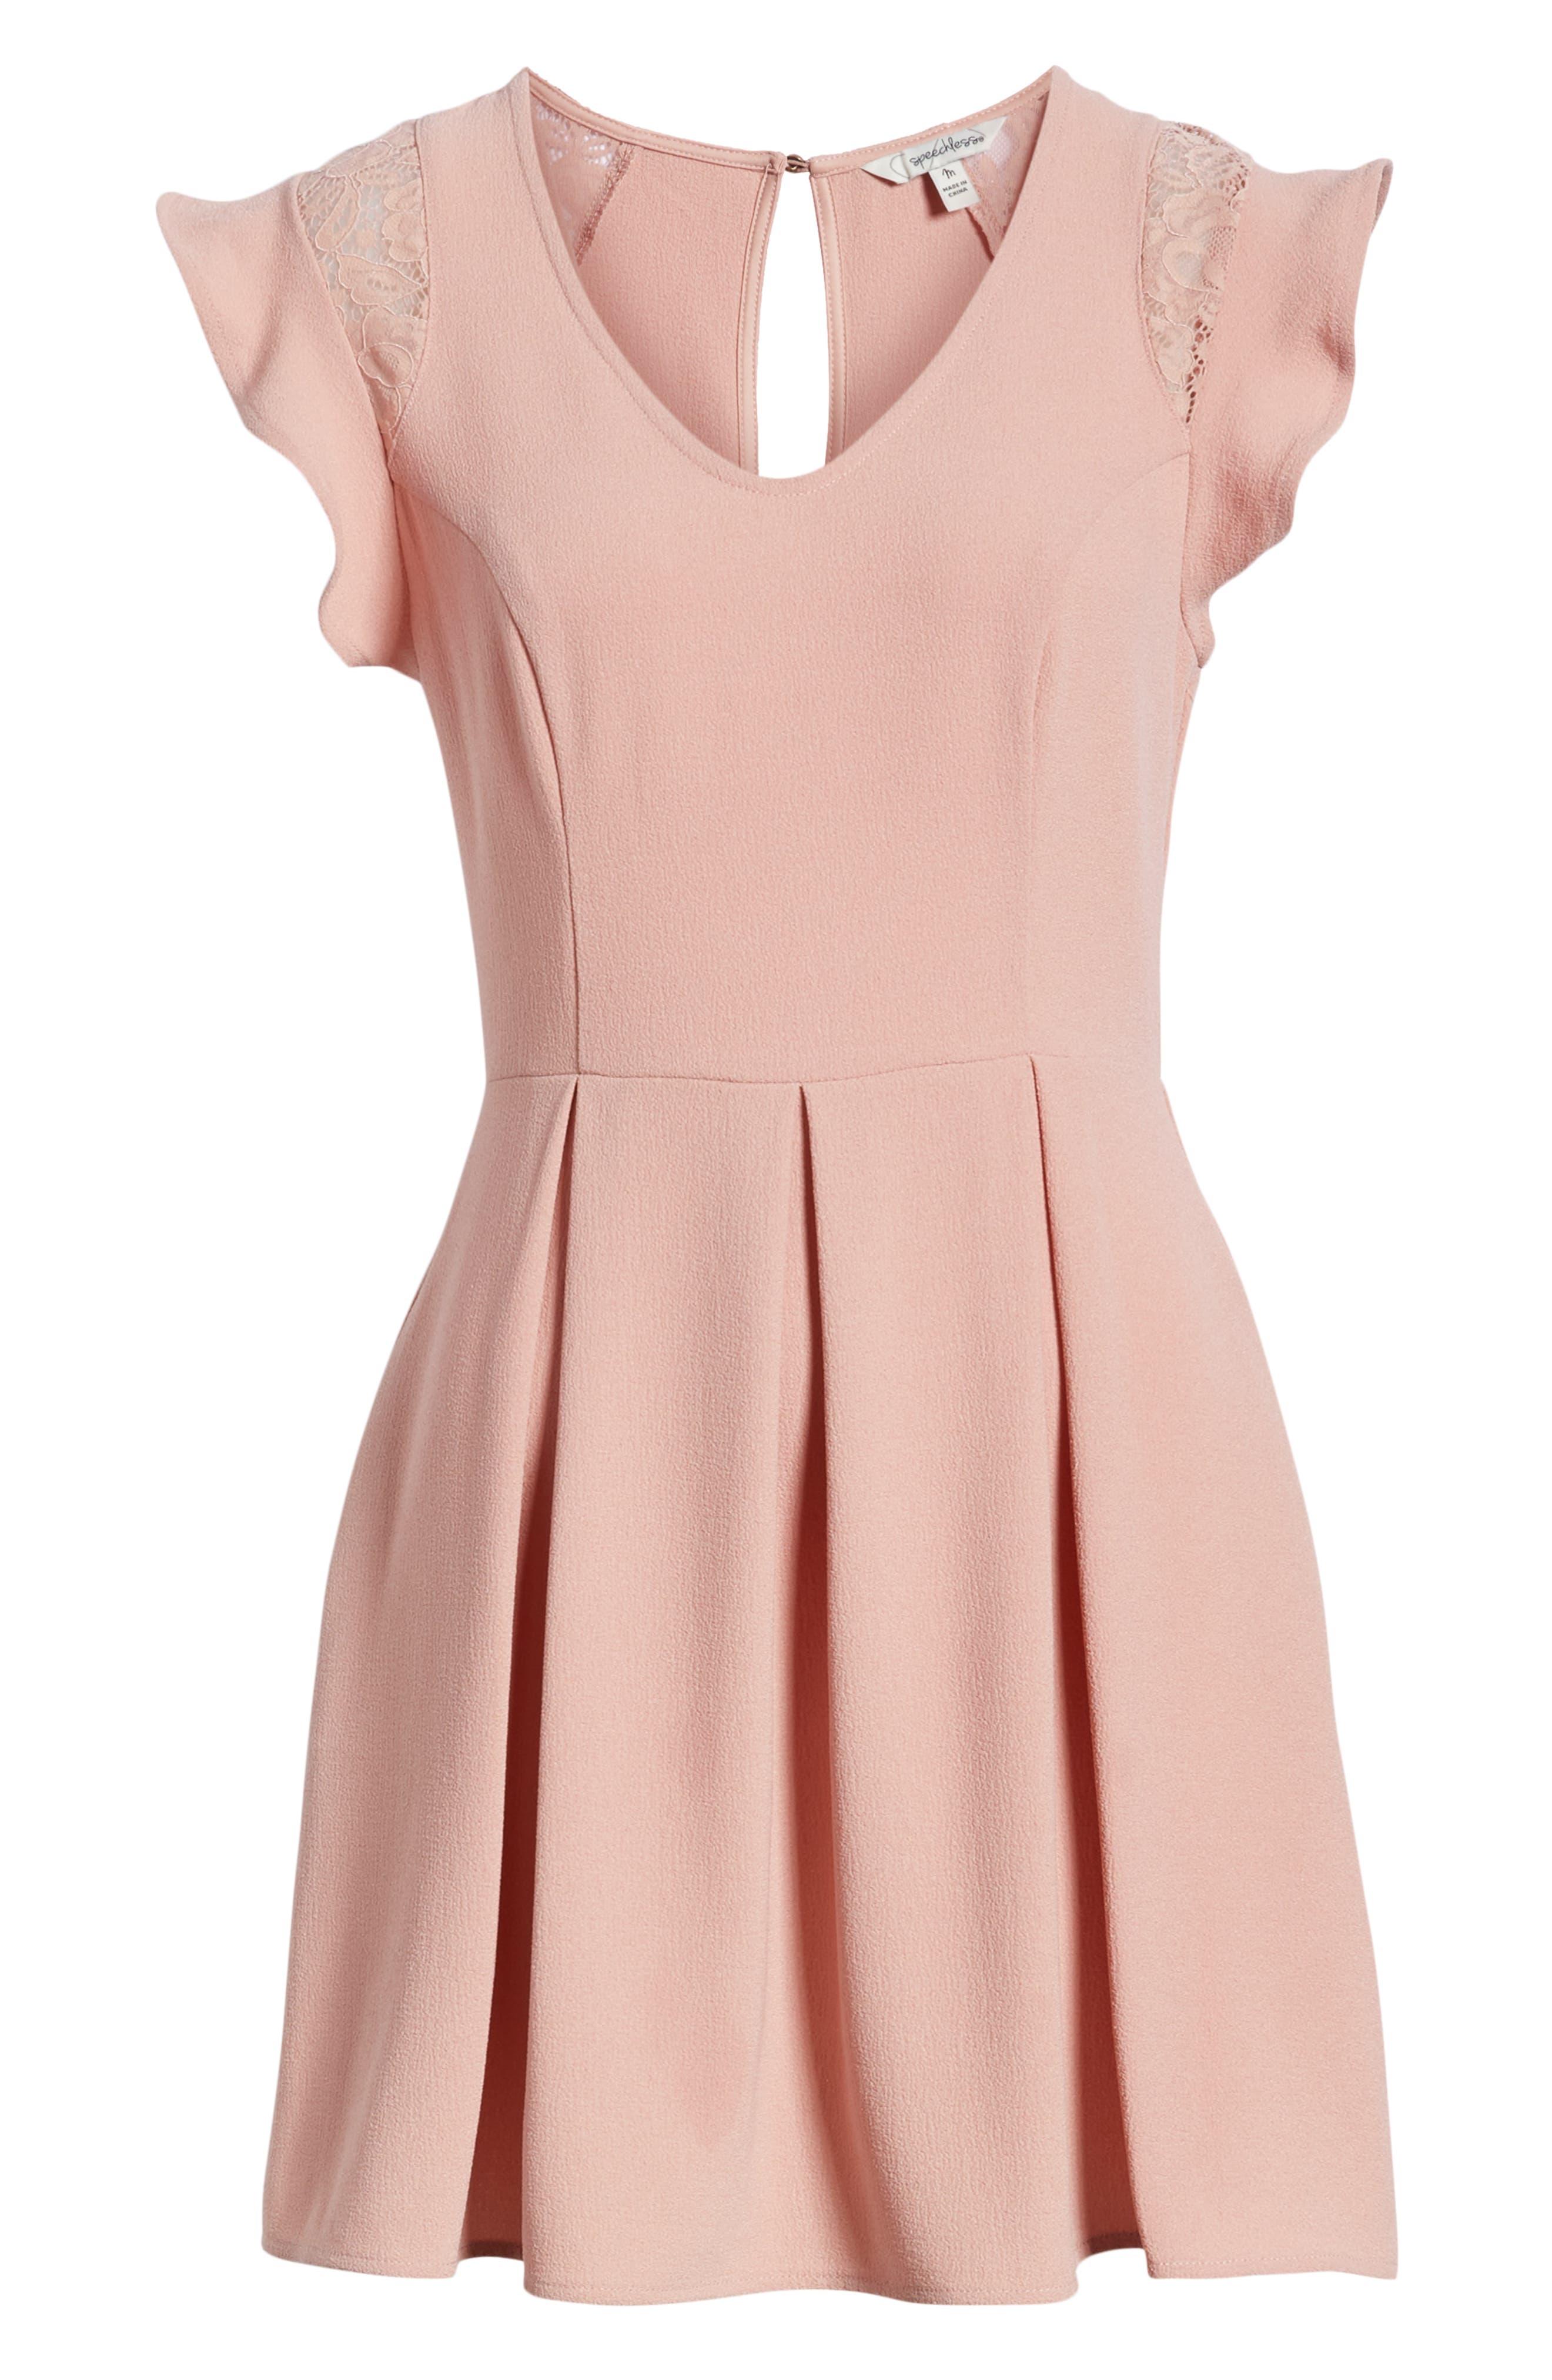 SPEECHLESS,                             Crepe Flutter Sleeve Fit & Flare Dress,                             Alternate thumbnail 7, color,                             ANTIQUE ROSE